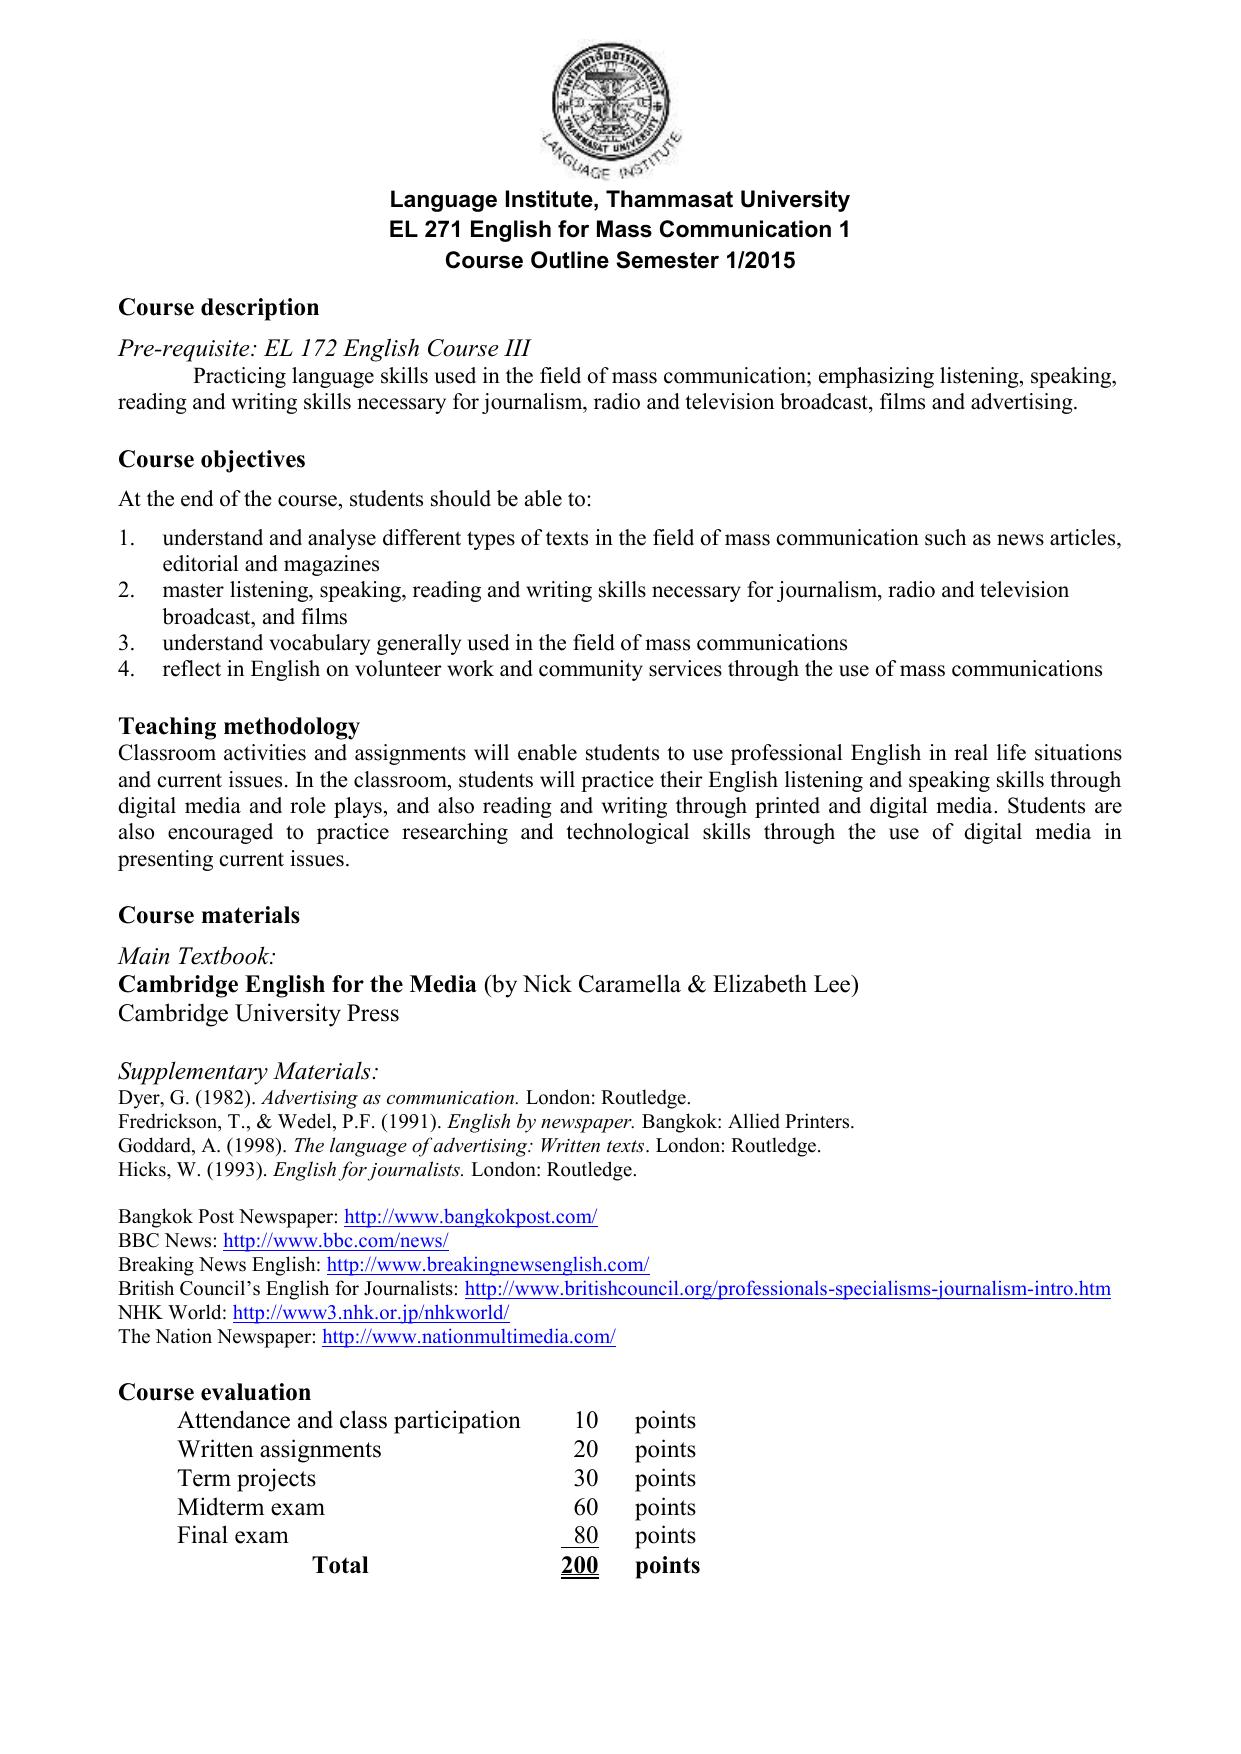 EL 271 English for Mass Communication 1